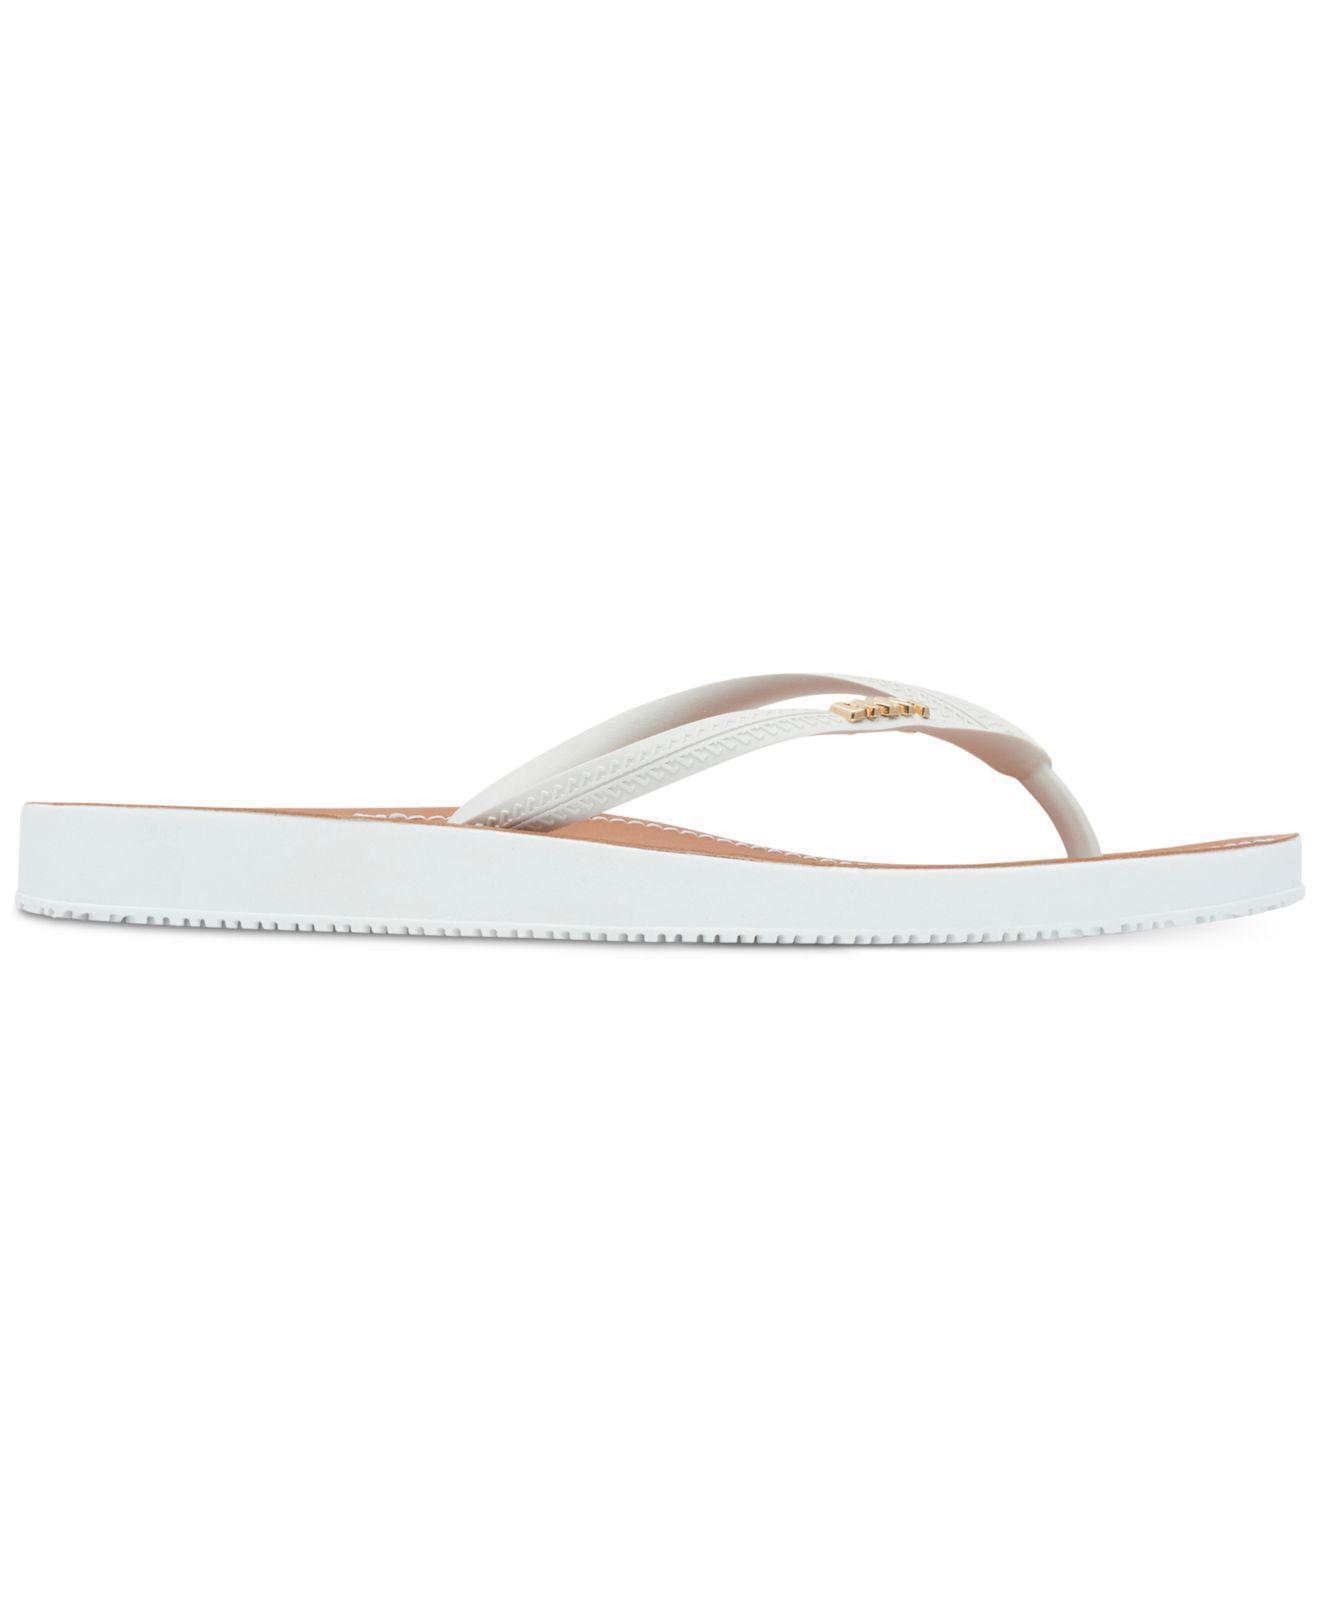 5fcbe7dc949 Lyst - DKNY Madi Flip-flops in White